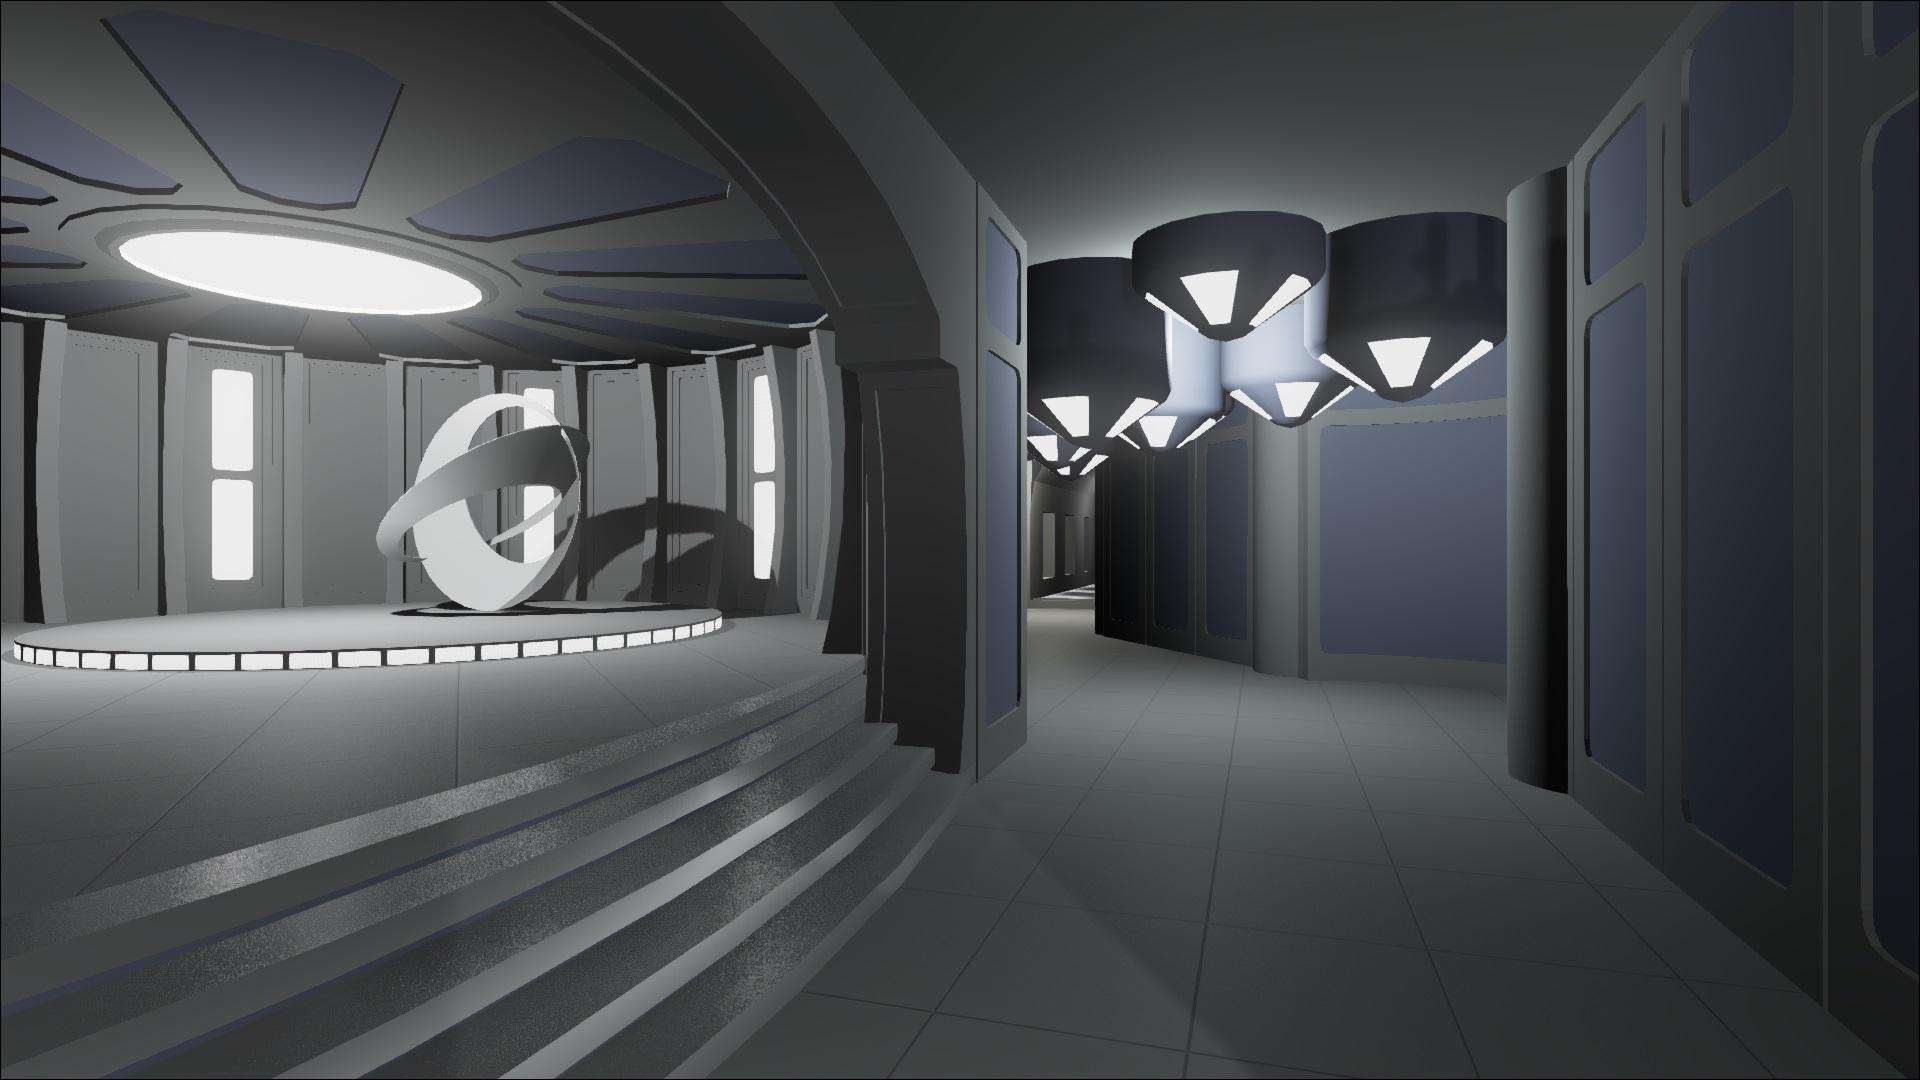 Cloud City Elevator Area 2 Image Star Wars Battlecry